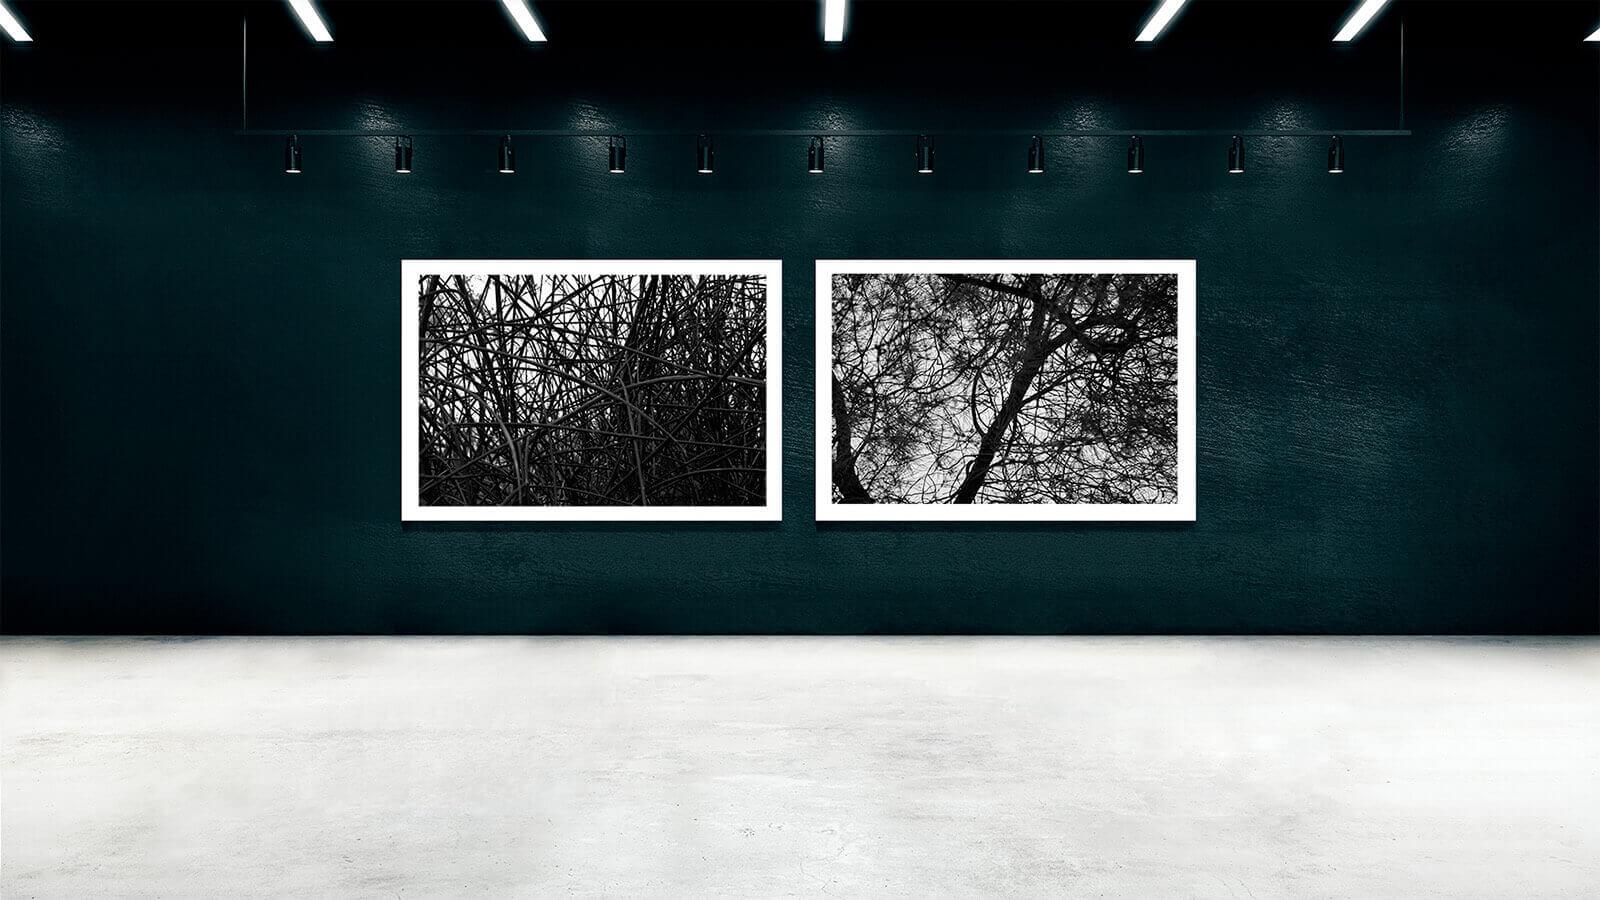 TAIYOKO-STUDIO-exposicion-Horno-Virtual-Gallery-branches-galeria-arte-fotografia-artistica-edicion-limitada-decoracion